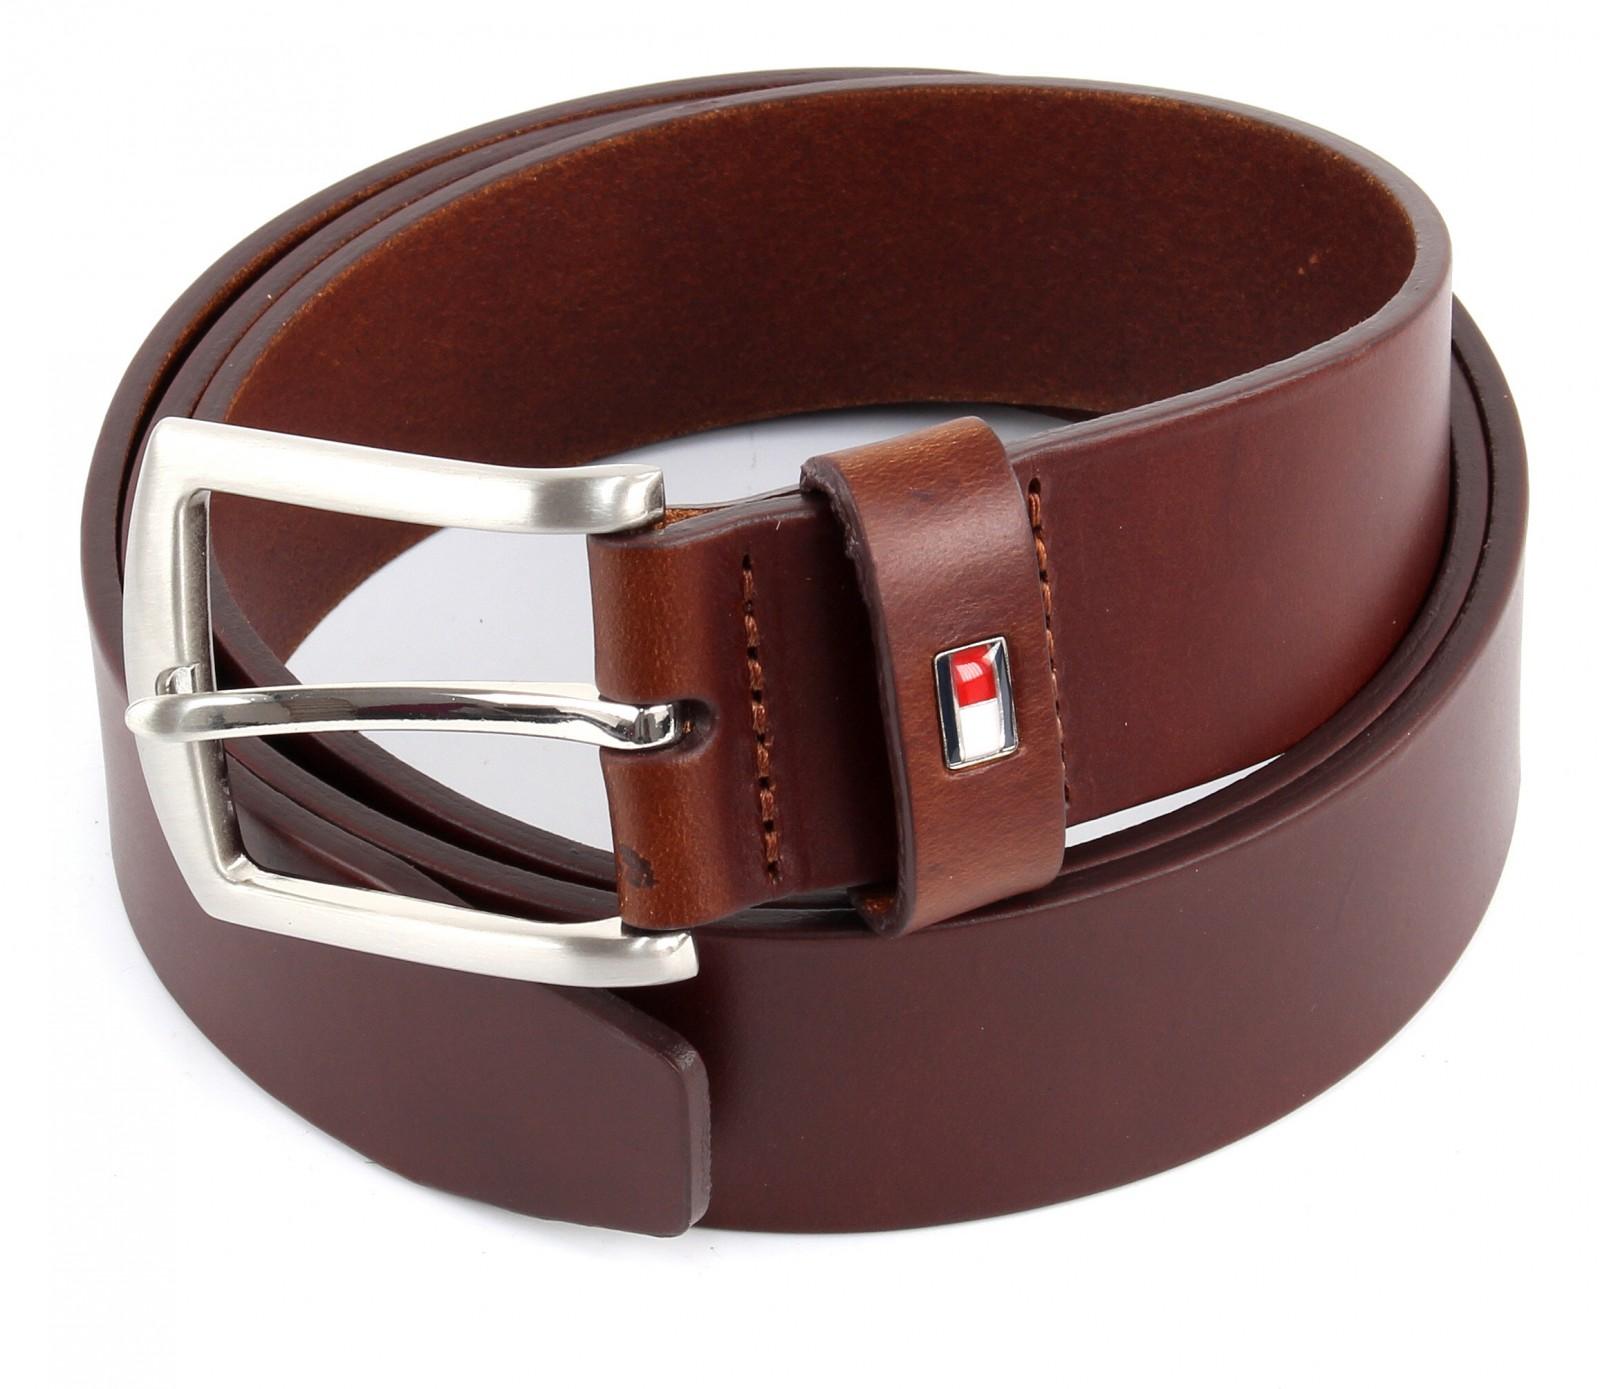 tommy hilfiger new denton belt w85 g rtel lederg rtel herreng rtel braun ebay. Black Bedroom Furniture Sets. Home Design Ideas